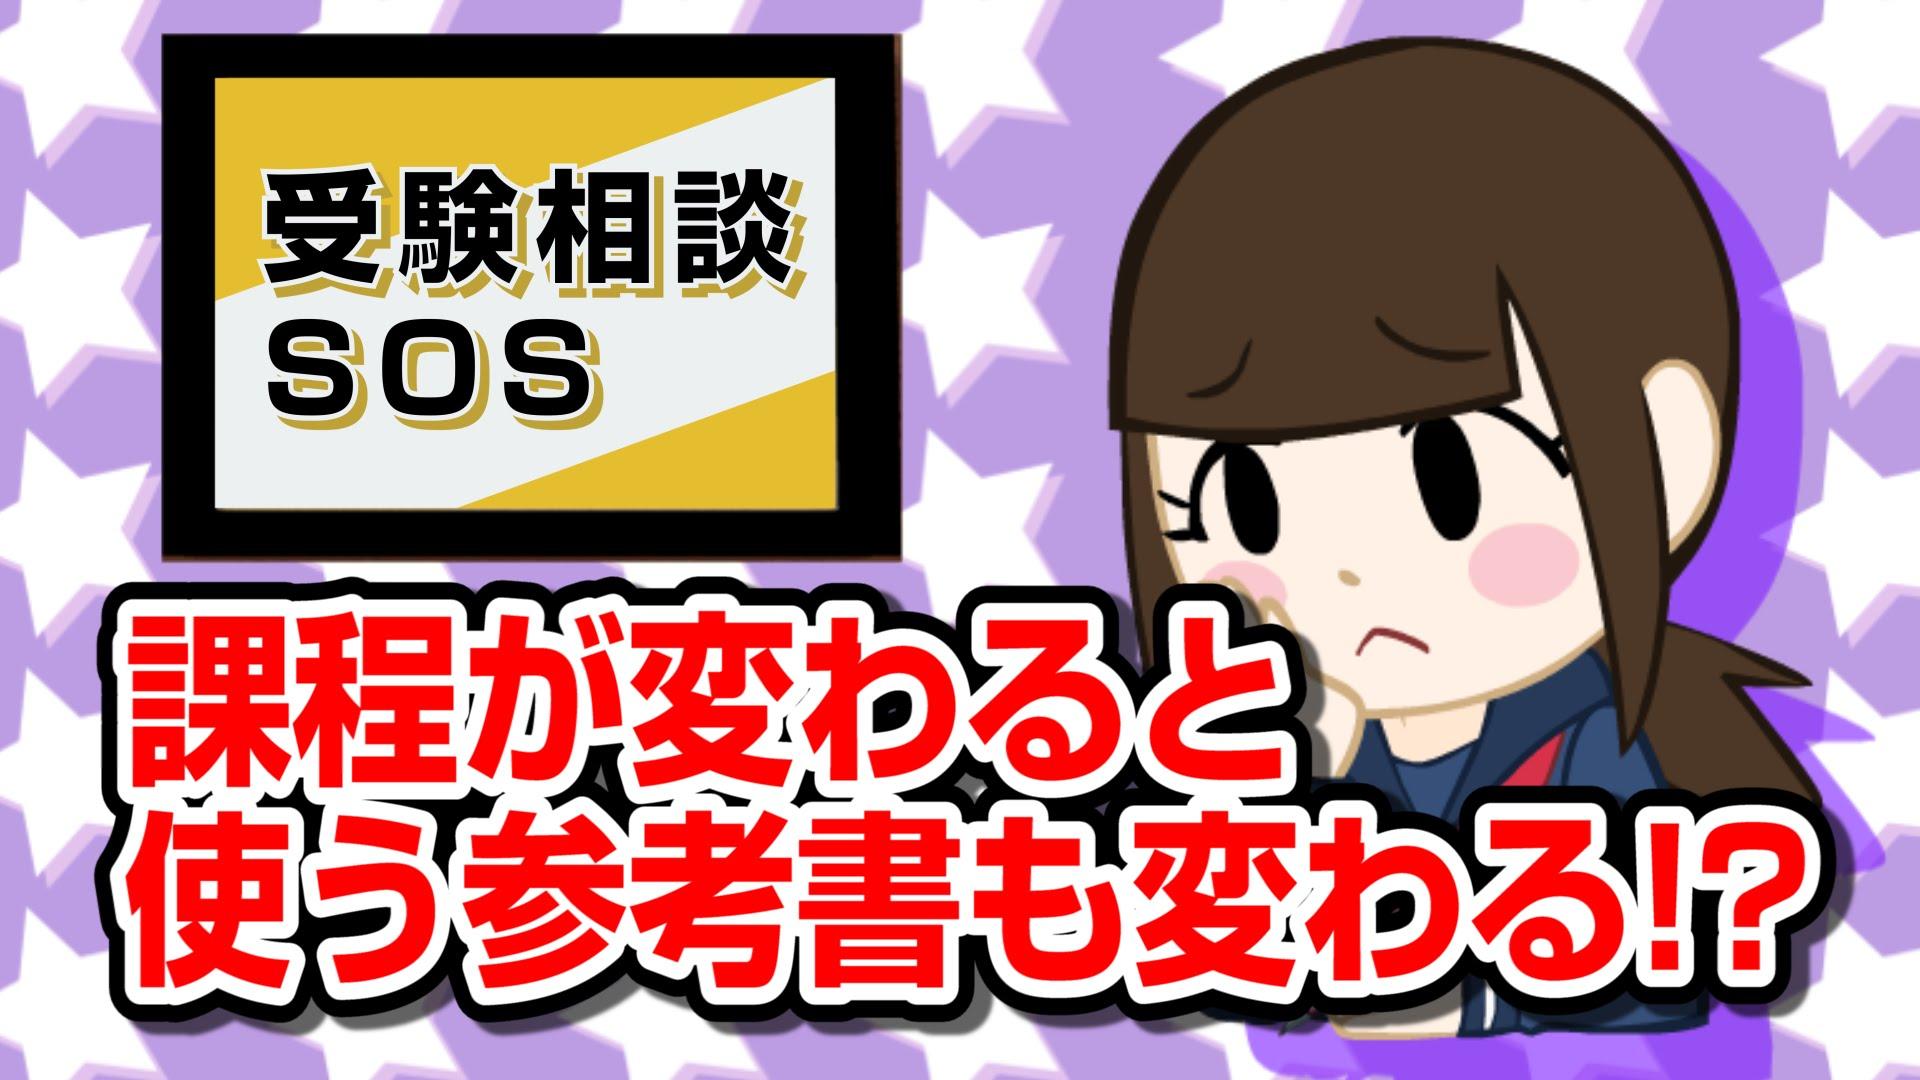 【vol.78】新課程になると参考書も変わる!?|受験相談SOS